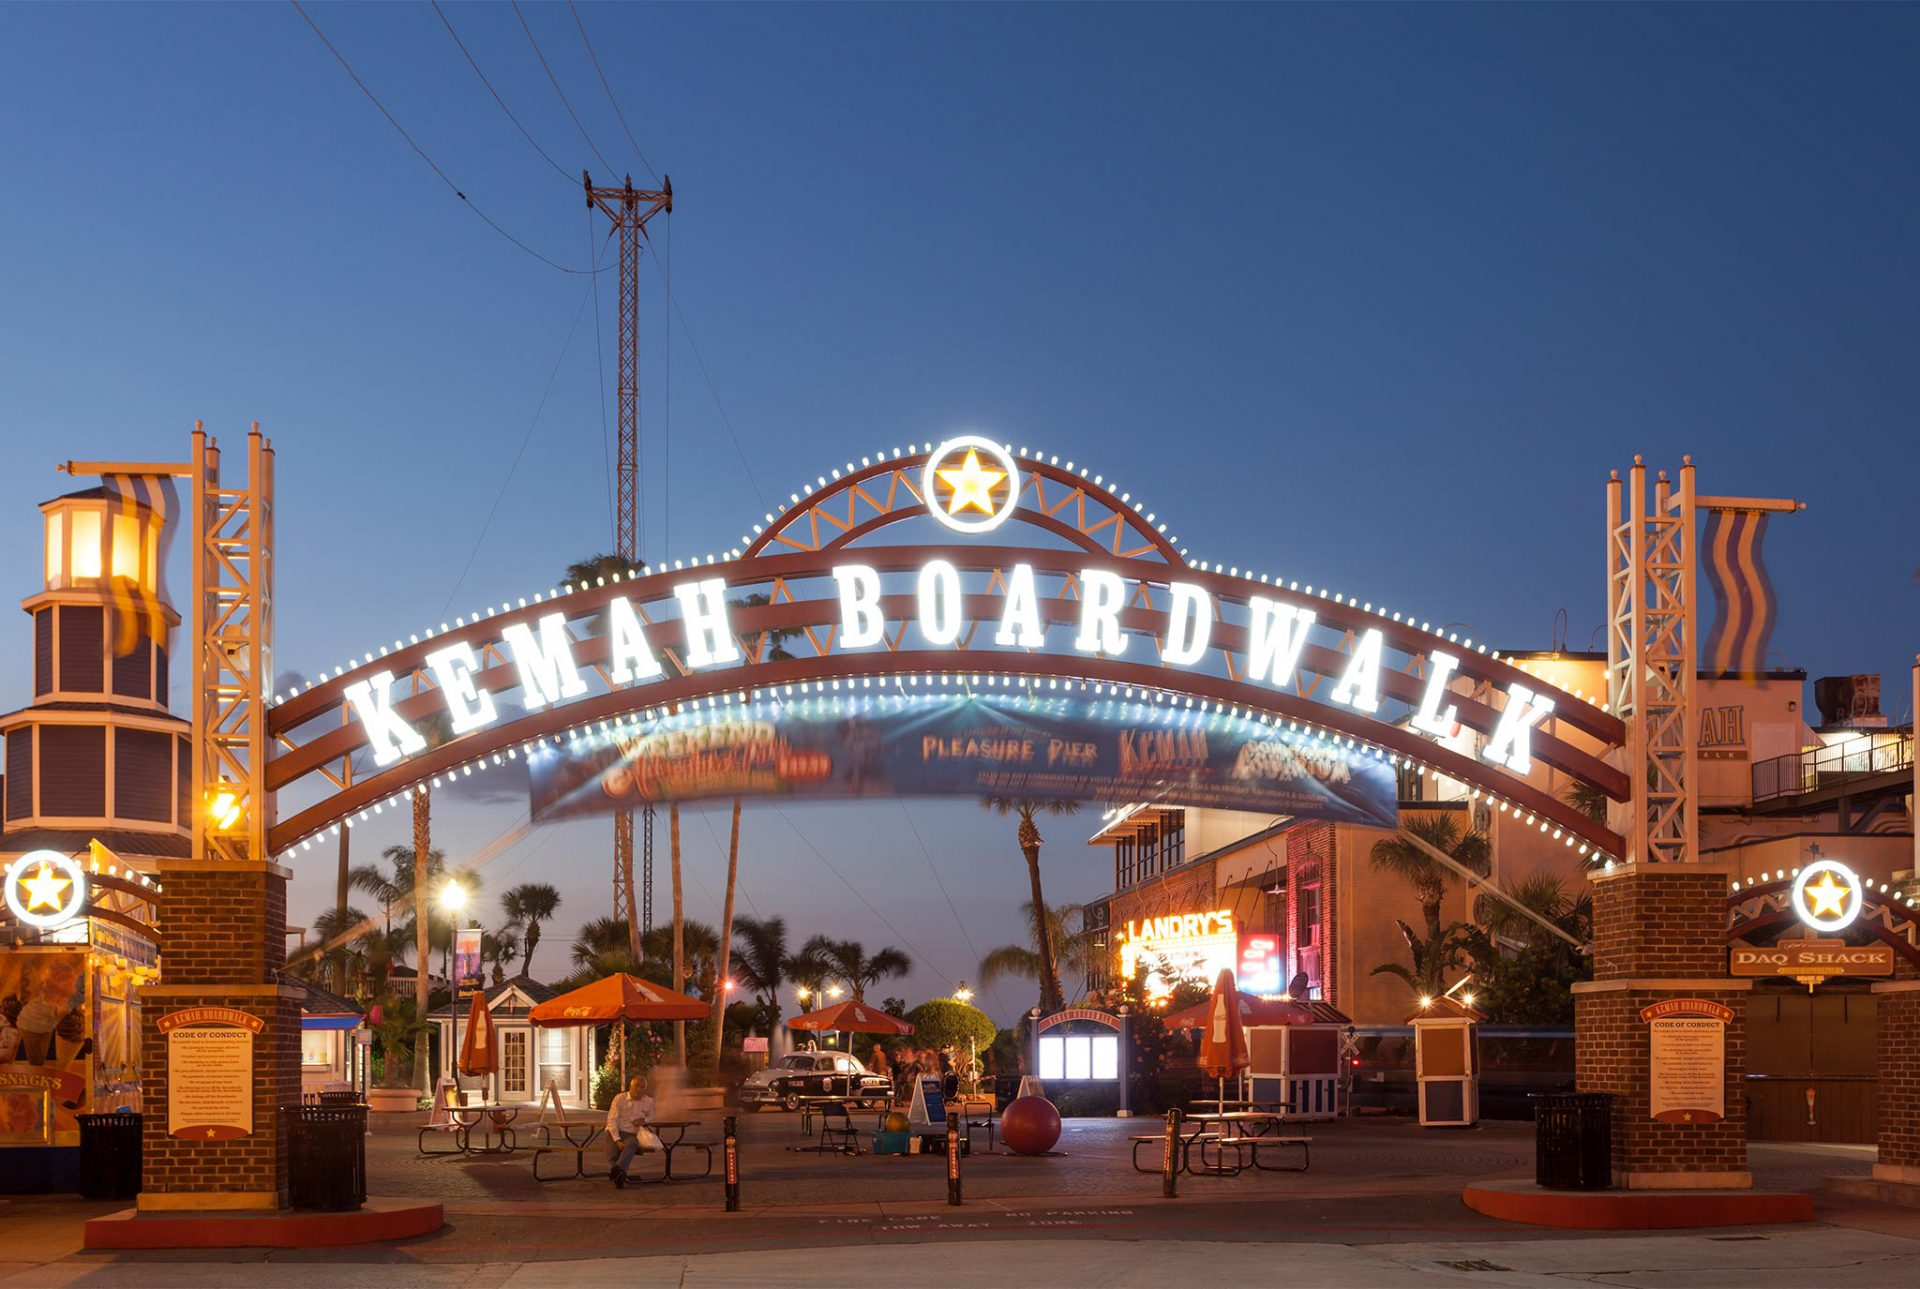 "<h3>Kemah Boardwalk</h3>""> </div> <div class="